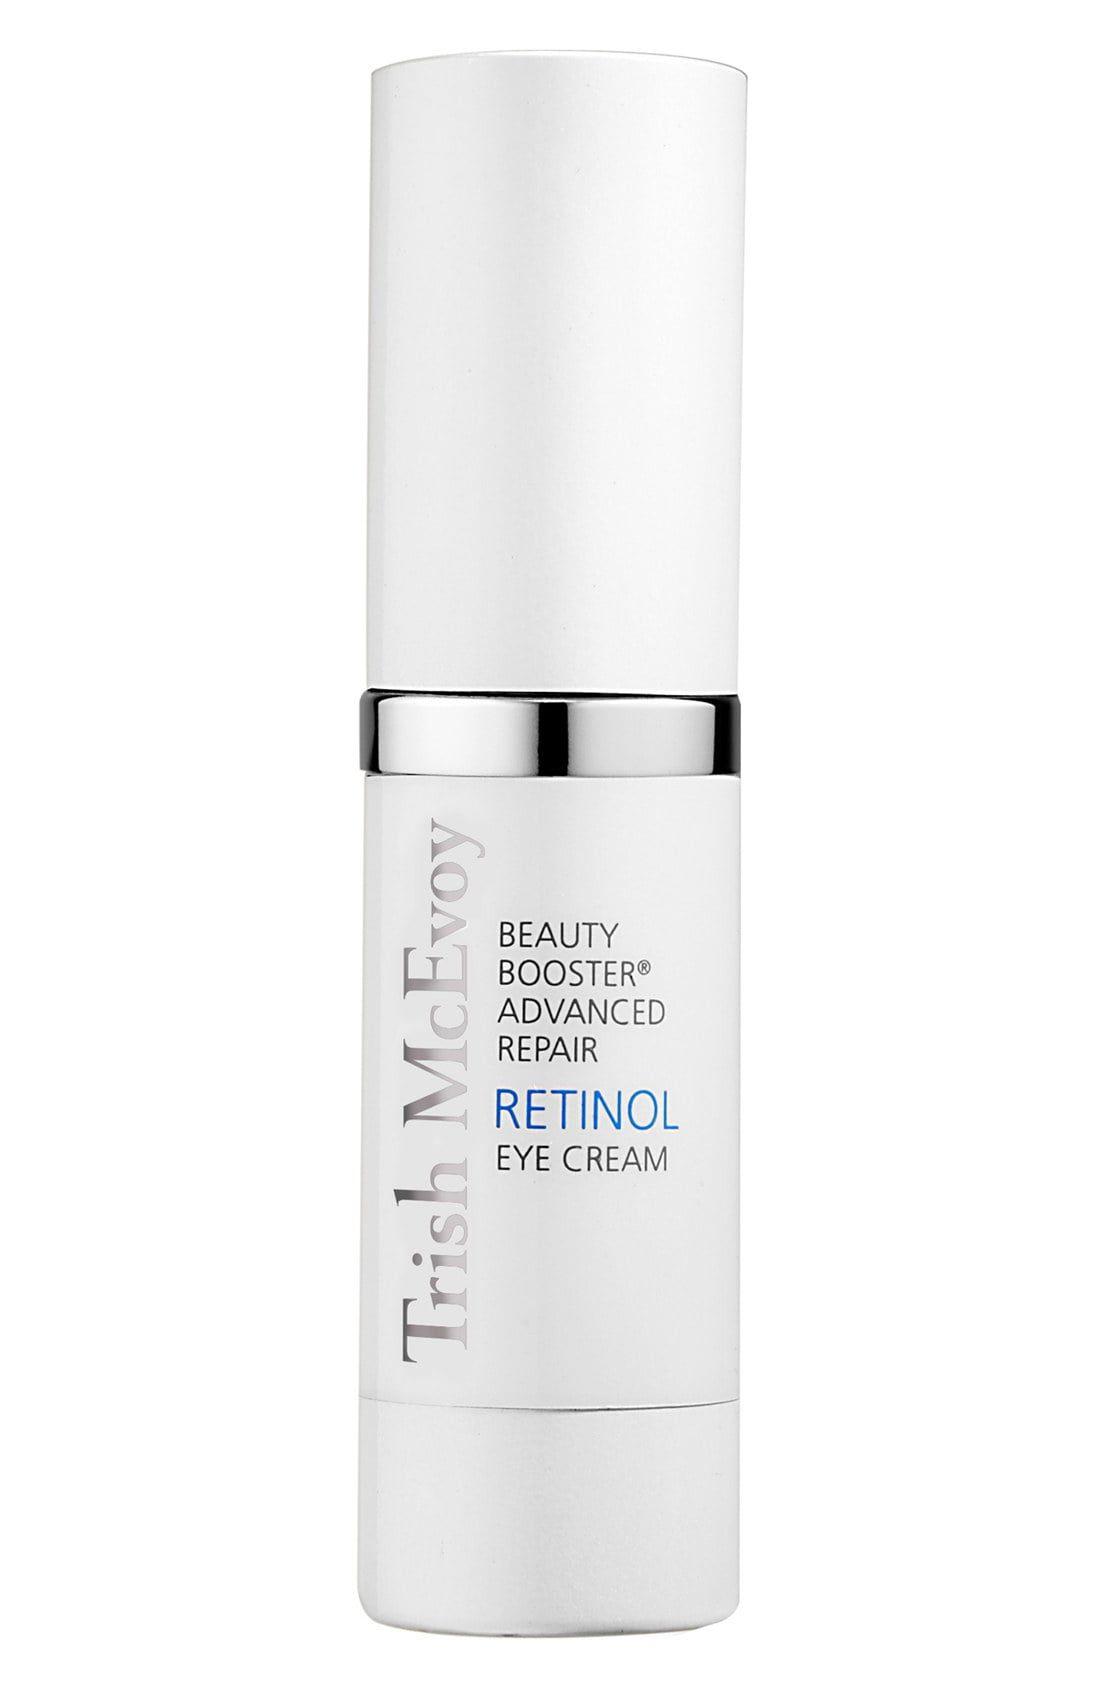 Trish Mcevoy Beauty Booster Retinol Eye Cream Size 0 5 Oz Retinol Eye Cream Eye Cream Skin Care Cream